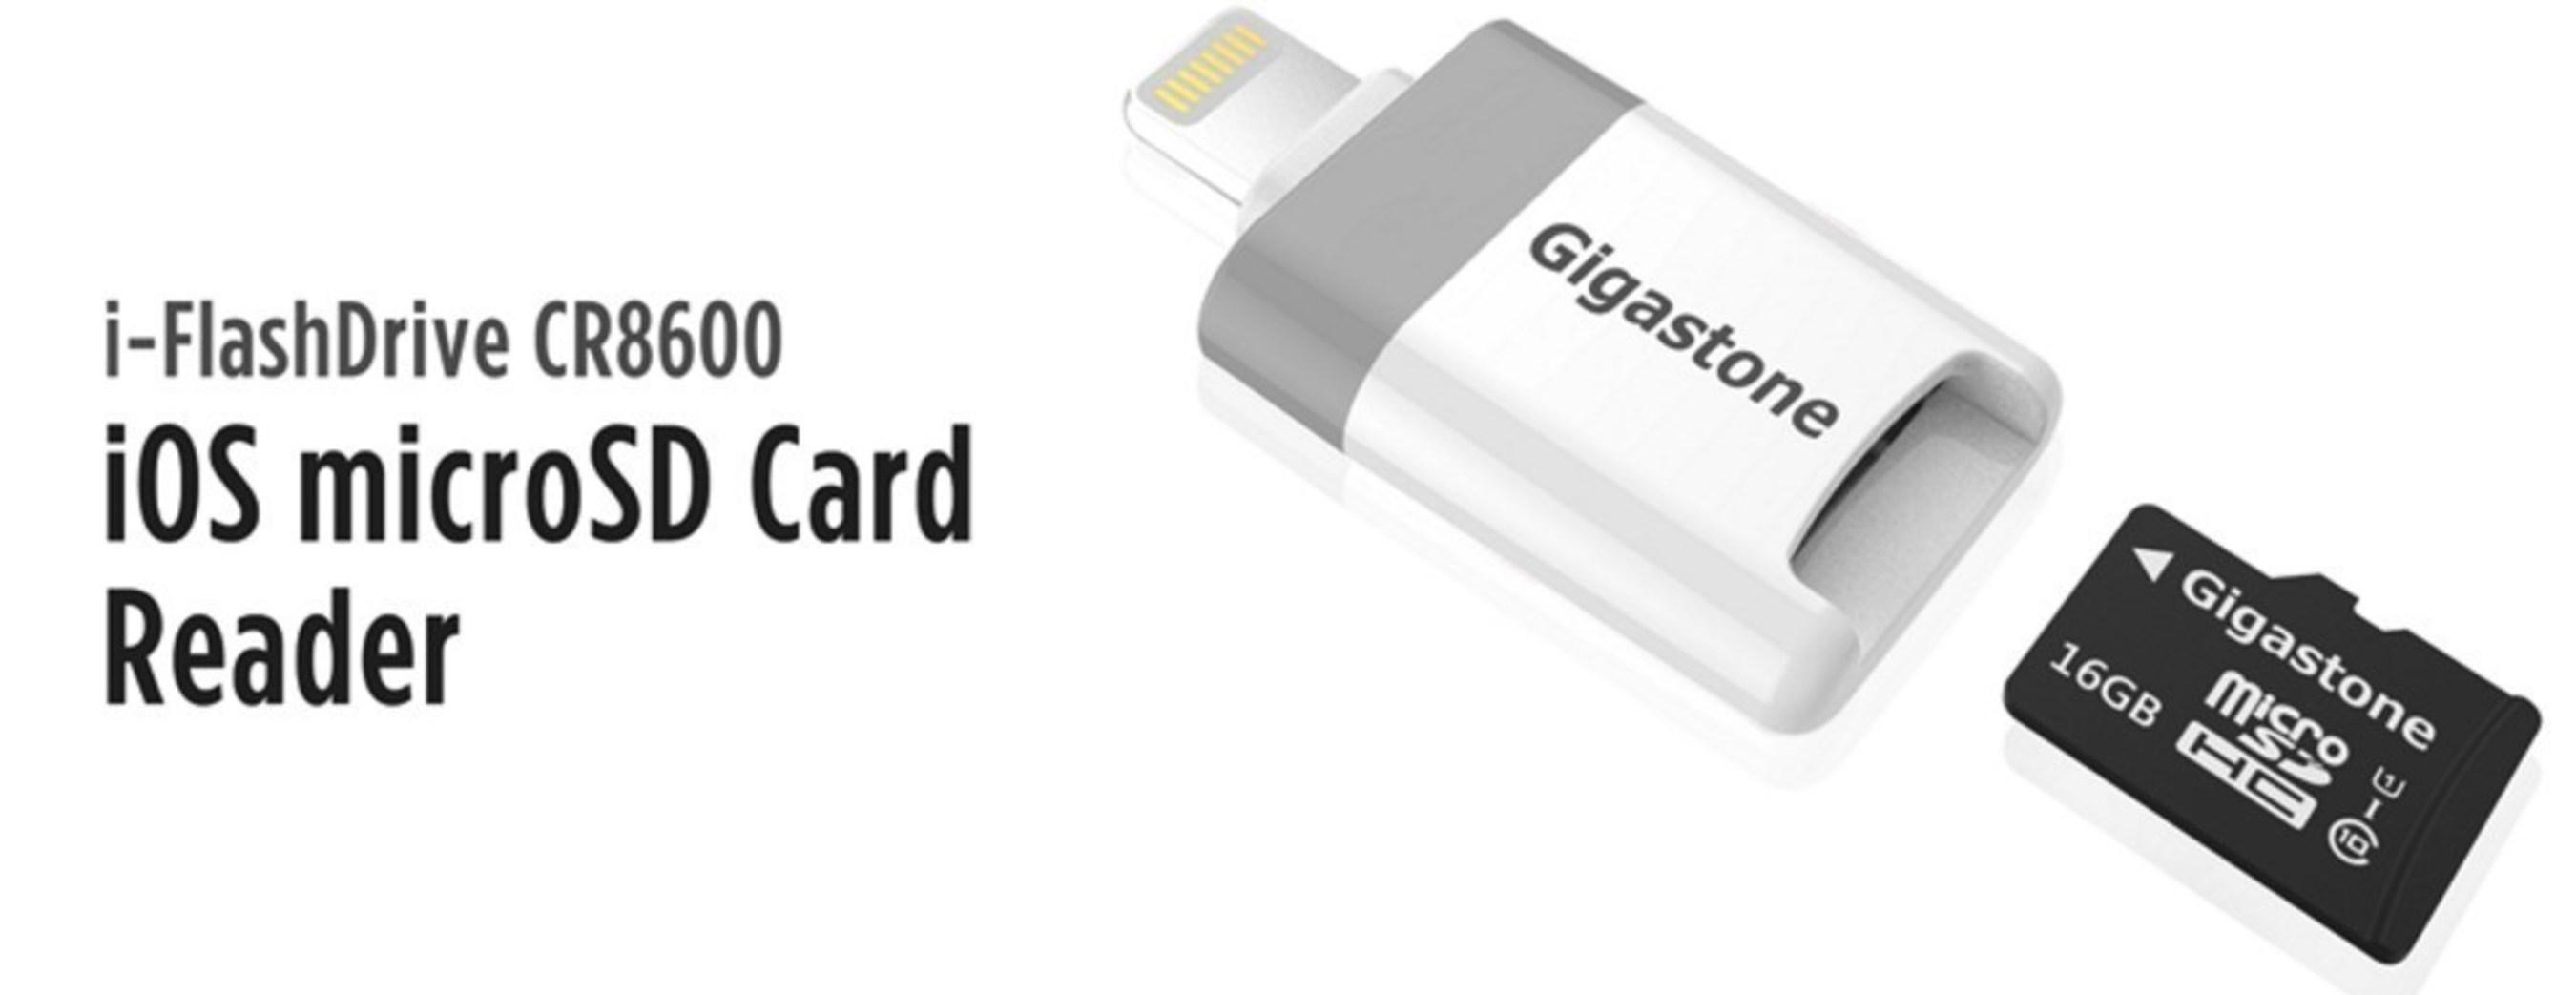 Ios Flash Drive Reader Nve Media Flashdisk Addlink Otg Dual Usb 32gb Blue Gigastone Iphone That Takes External Micro Sd Card Memory